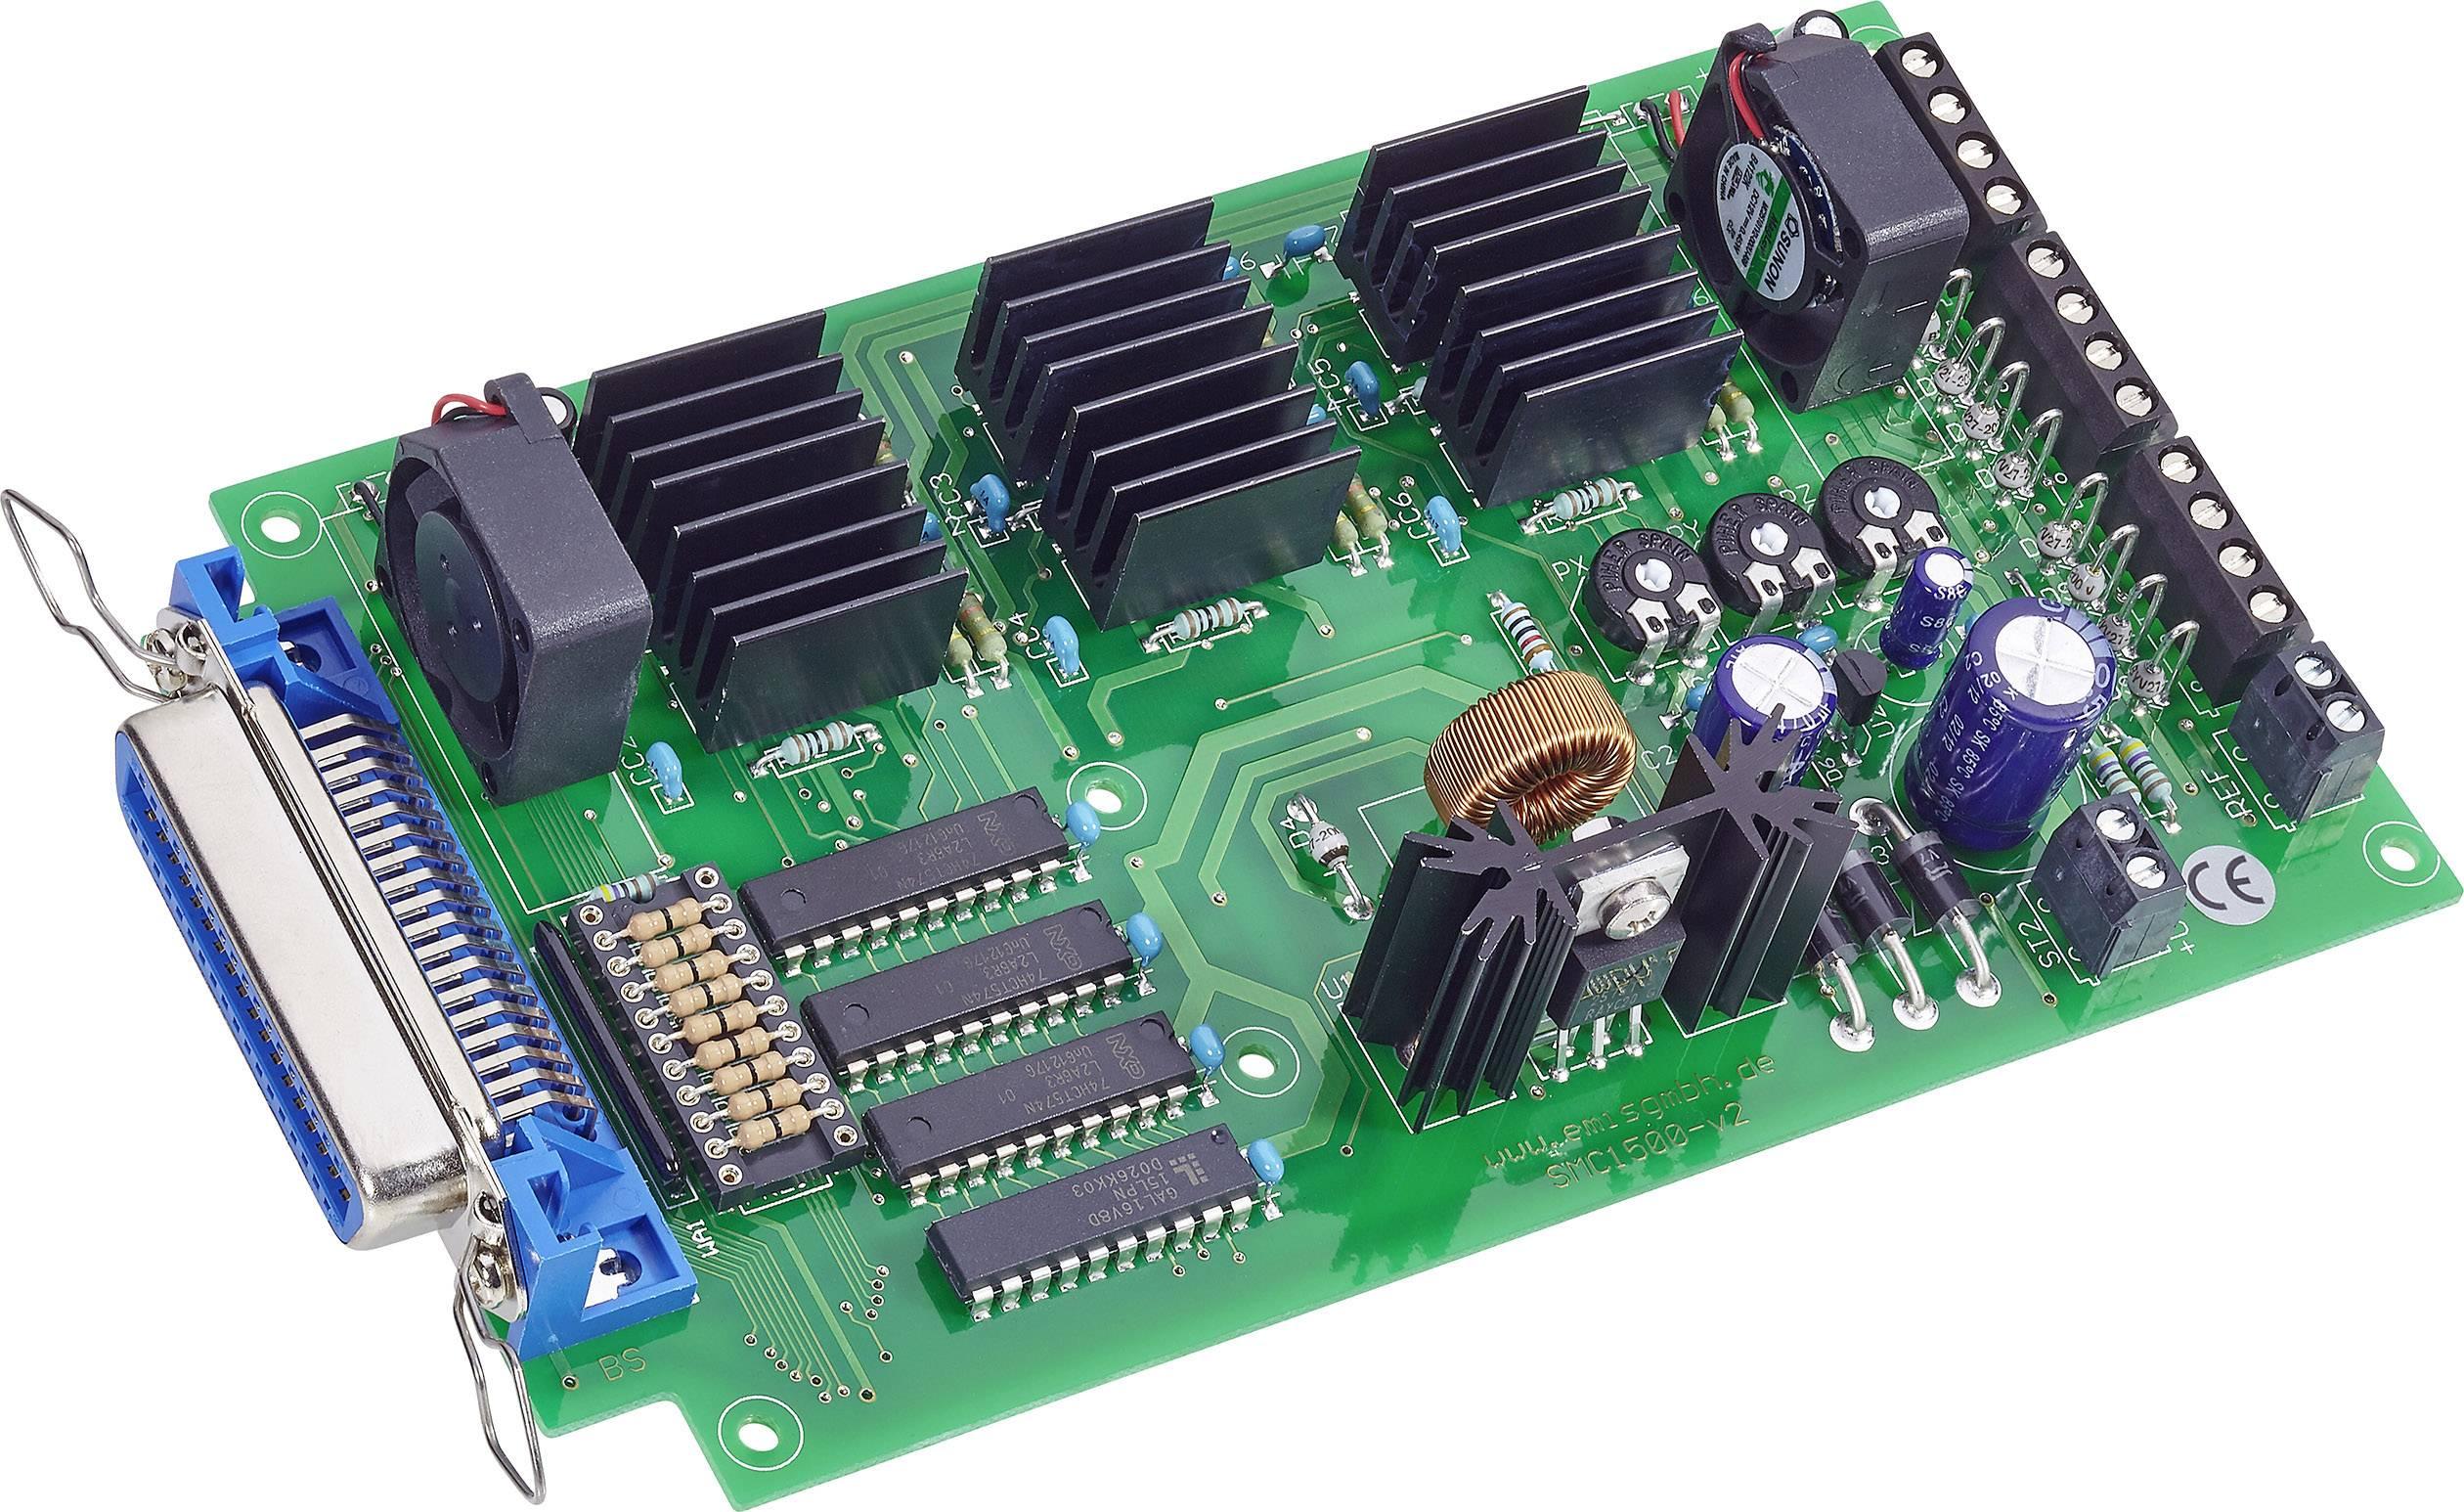 Riadiaca karta Emis SMC-1500, 1.5 A